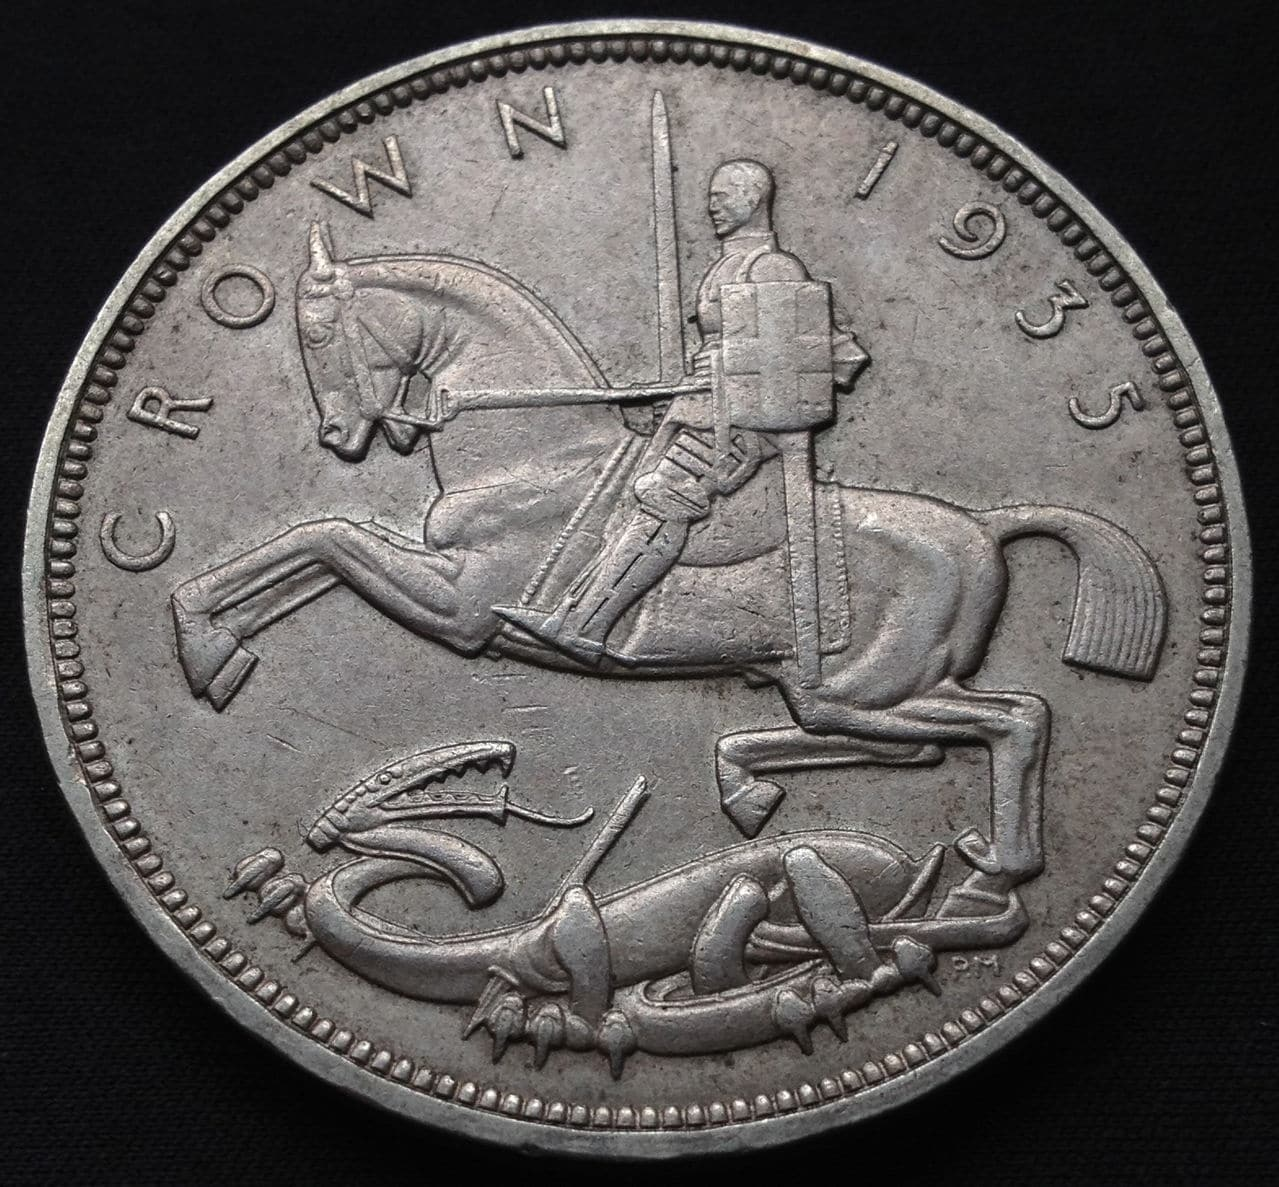 1 corona 1935 -Jorge V IMG_2778